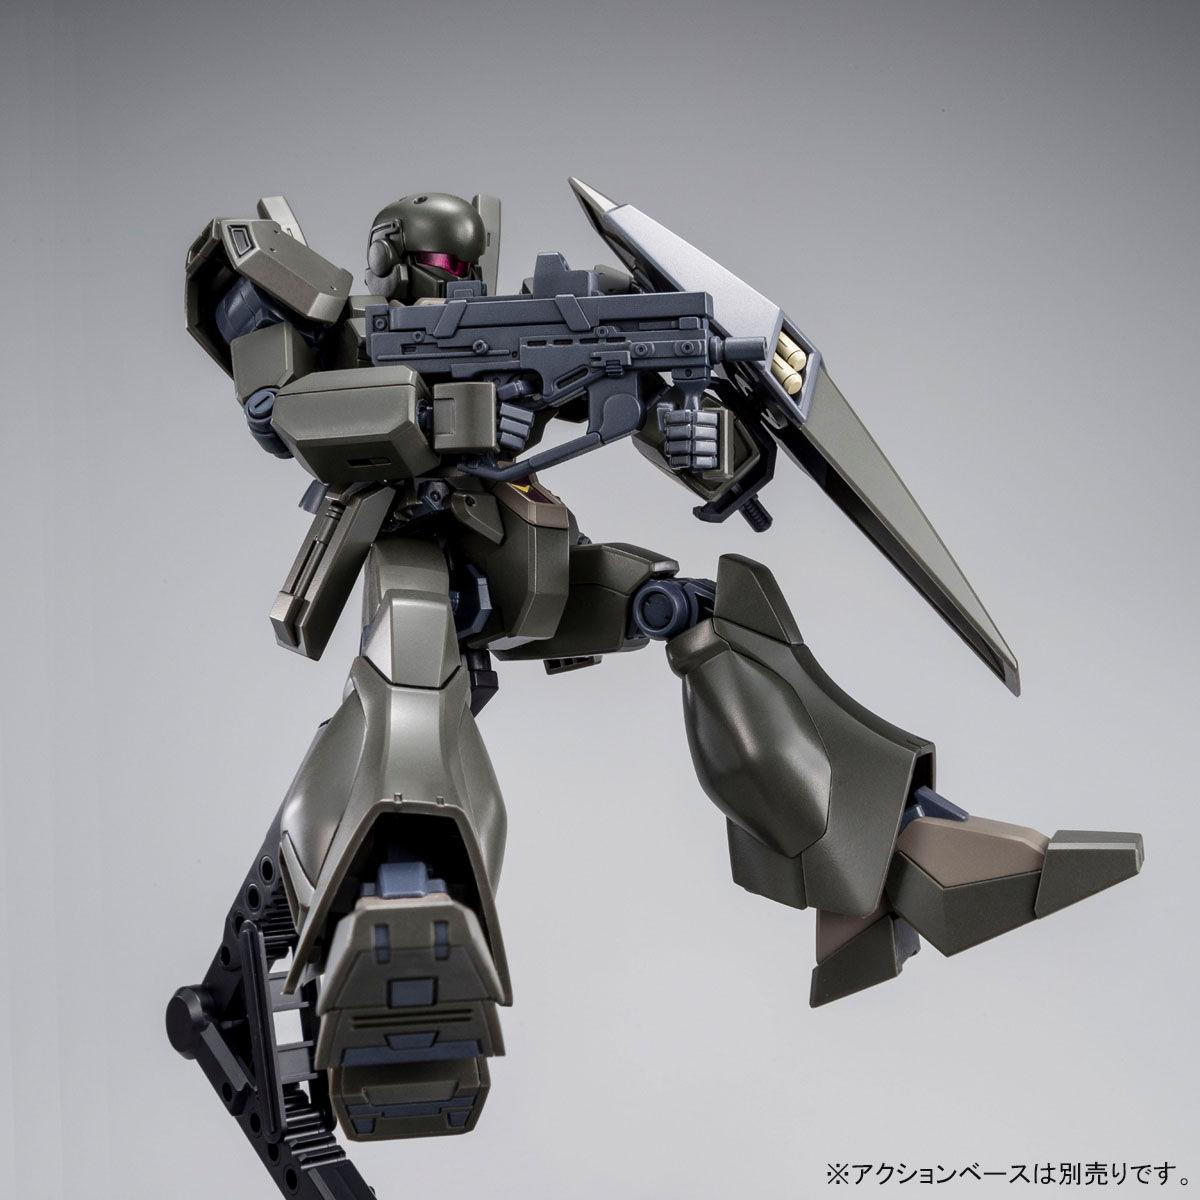 HG 1/144『ジェガンD型 (護衛隊仕様)』機動戦士ガンダムNT プラモデル-005